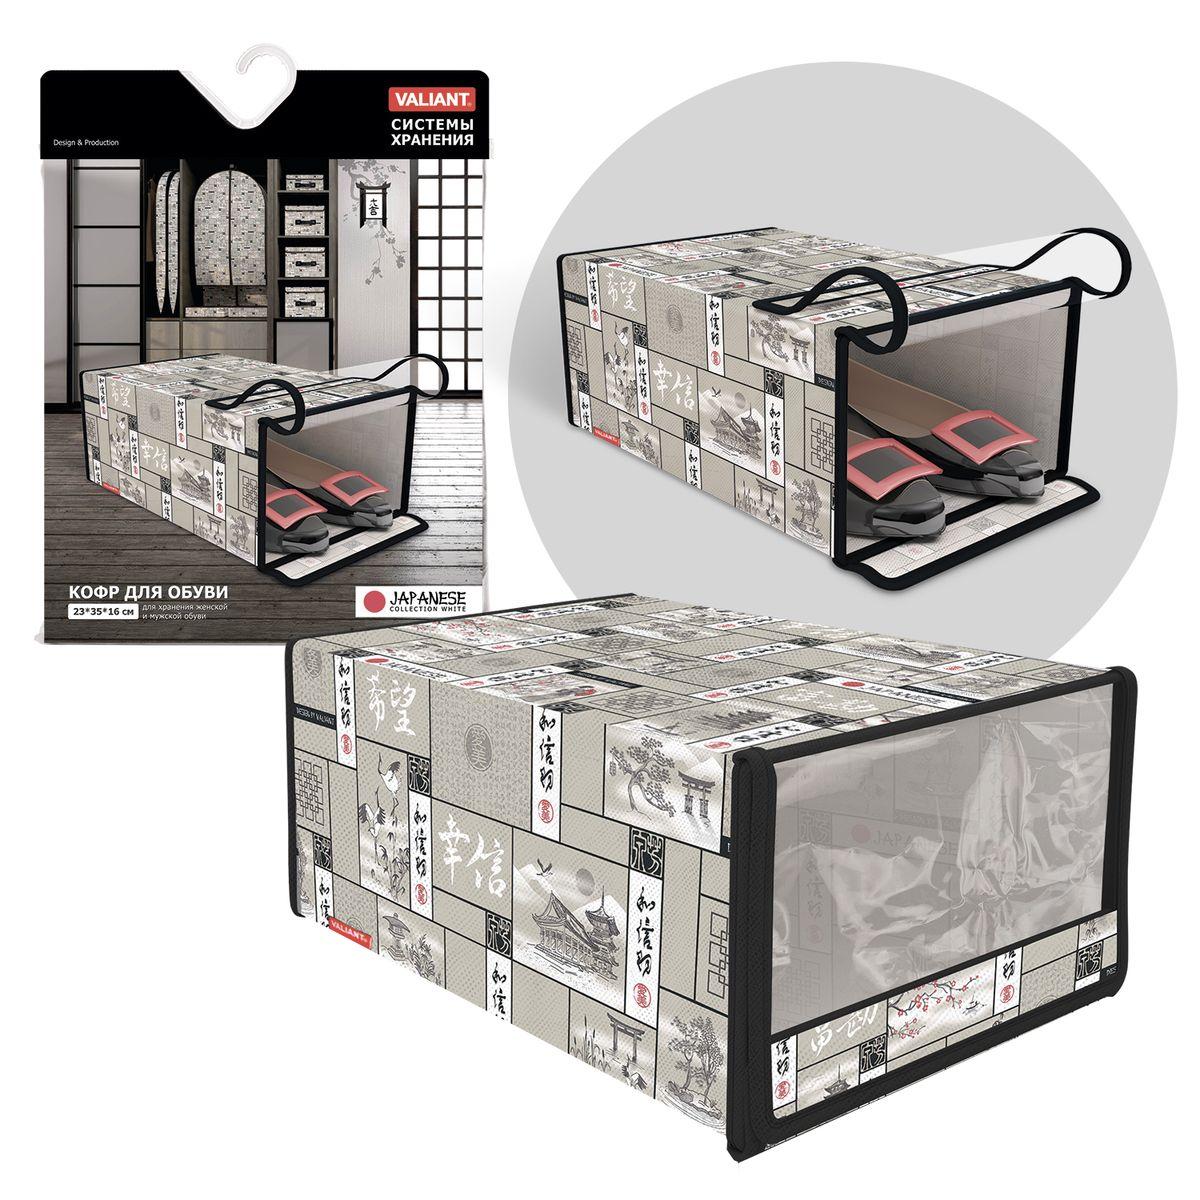 "Кофр для хранения обуви Valiant ""Japanese White"", 23 х 35 х 16 см JW-S1"